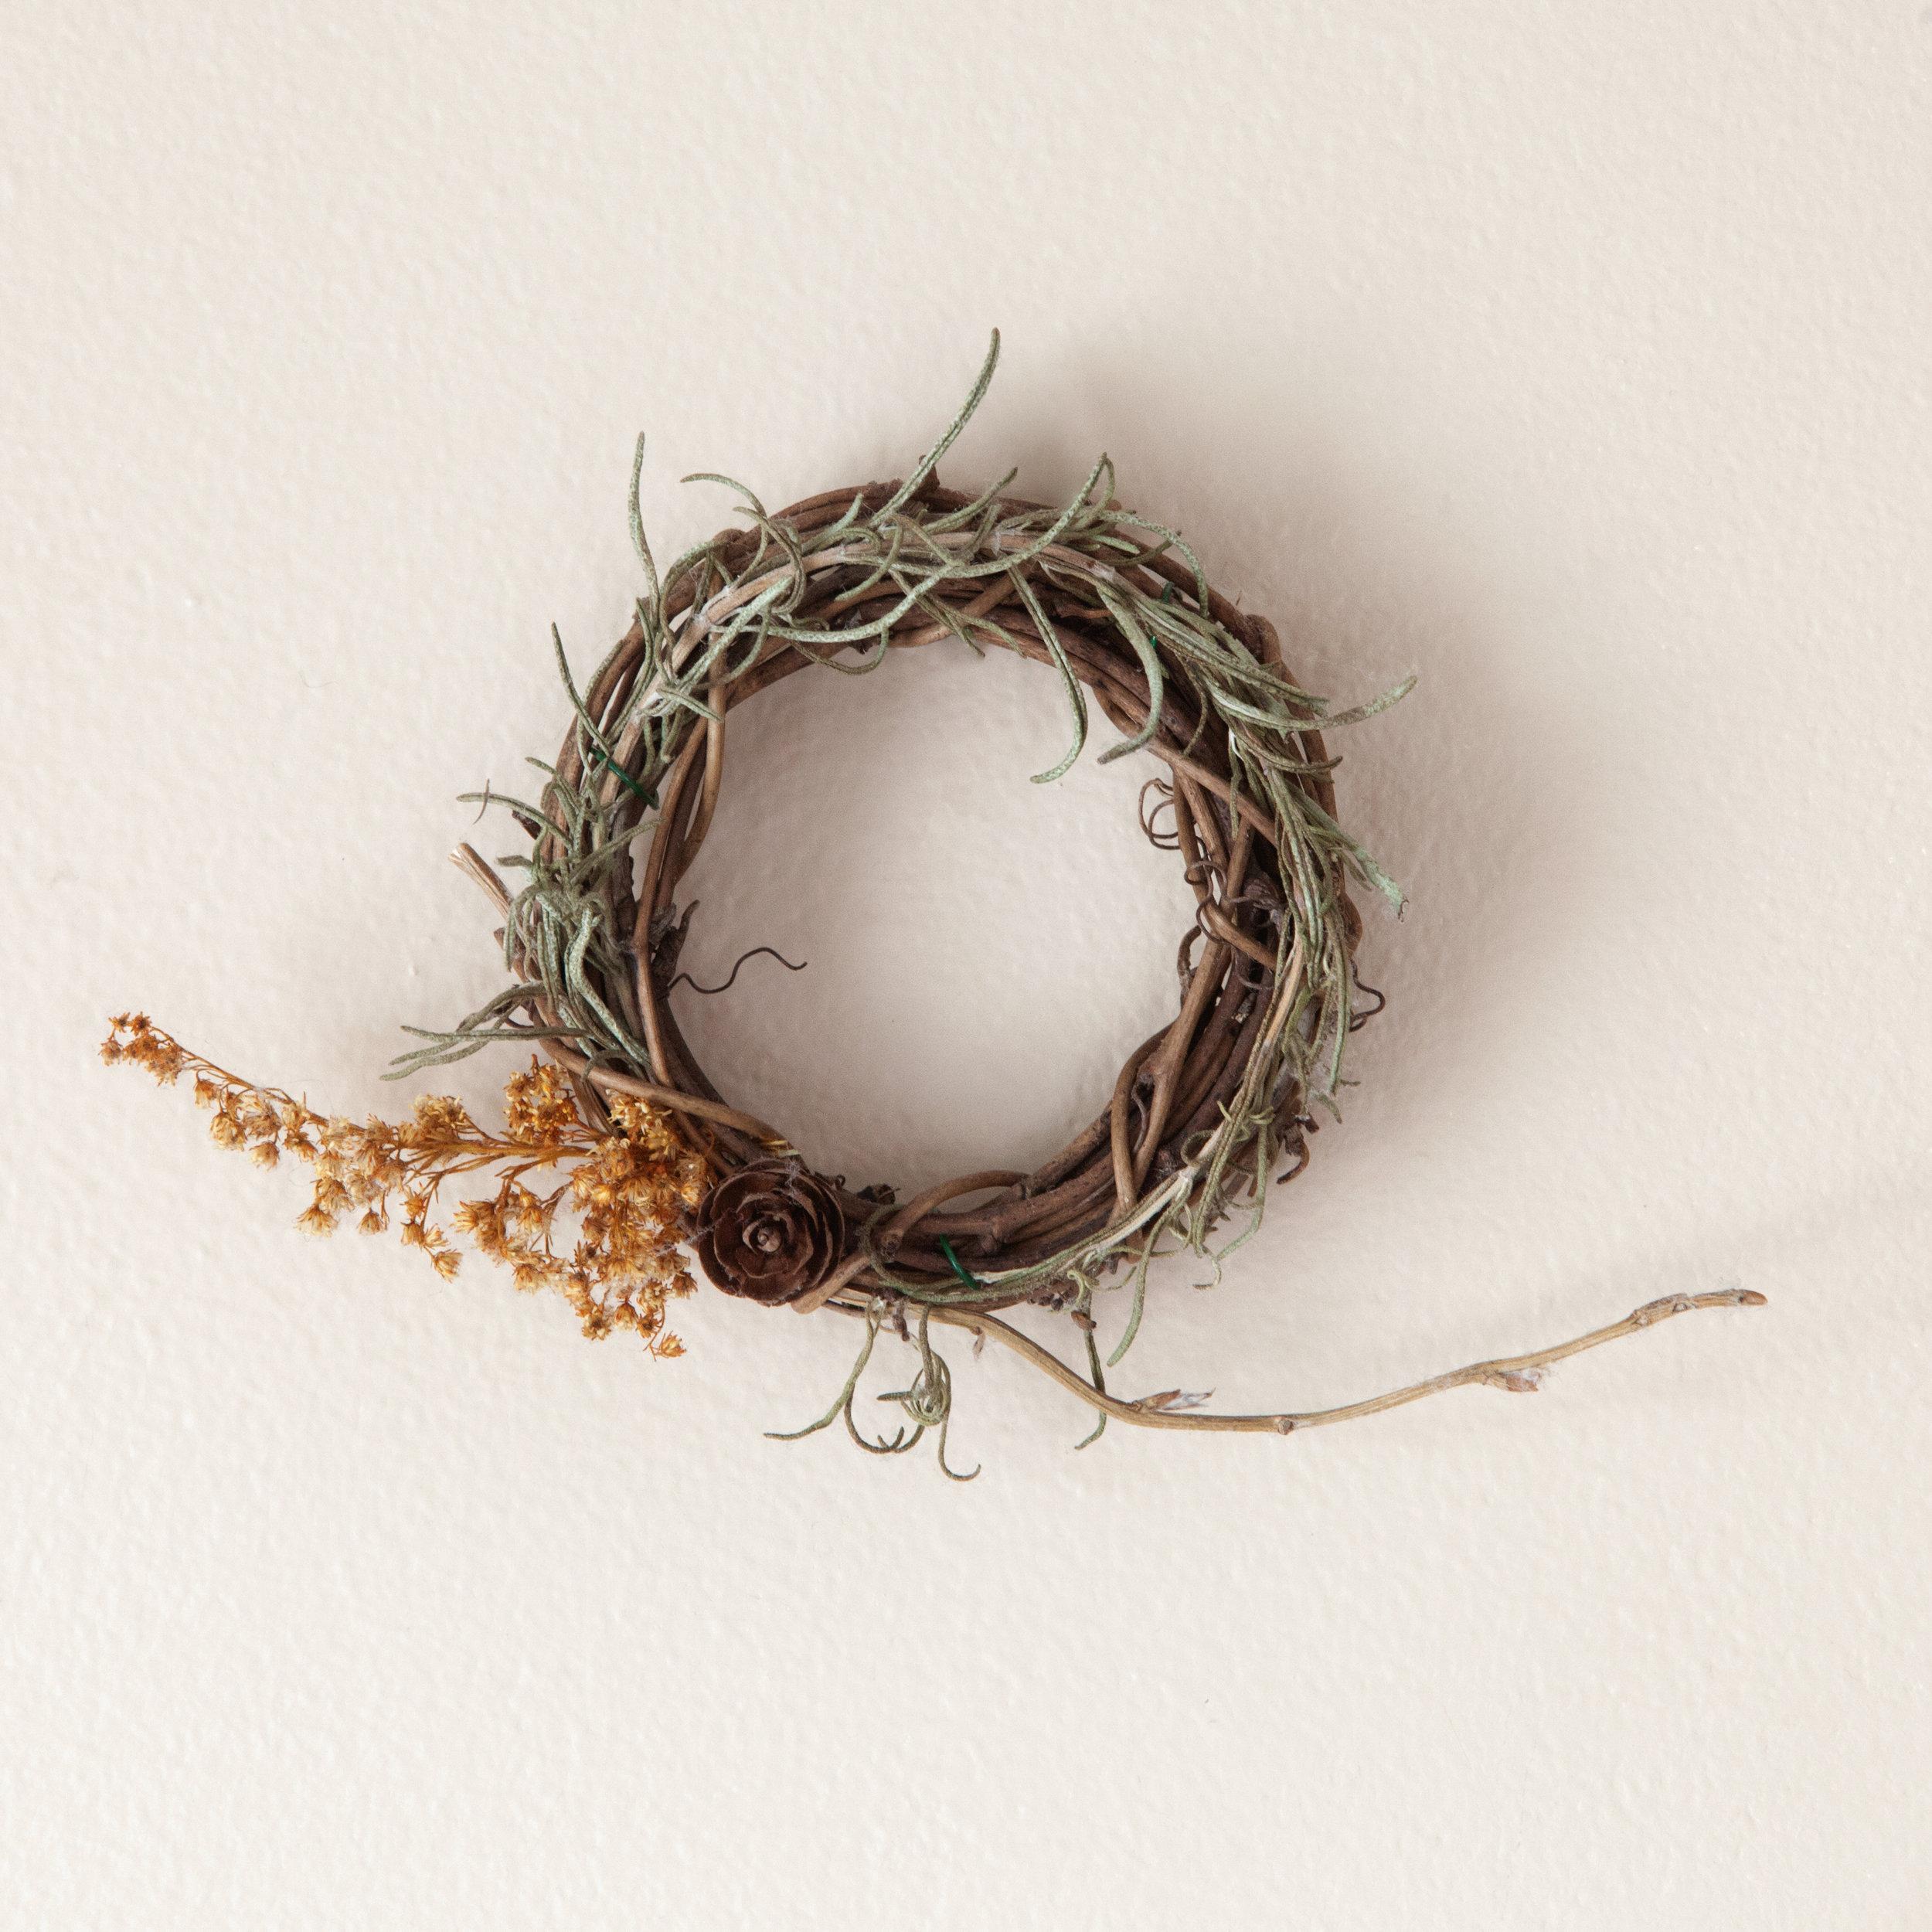 Wreath_0150.jpg